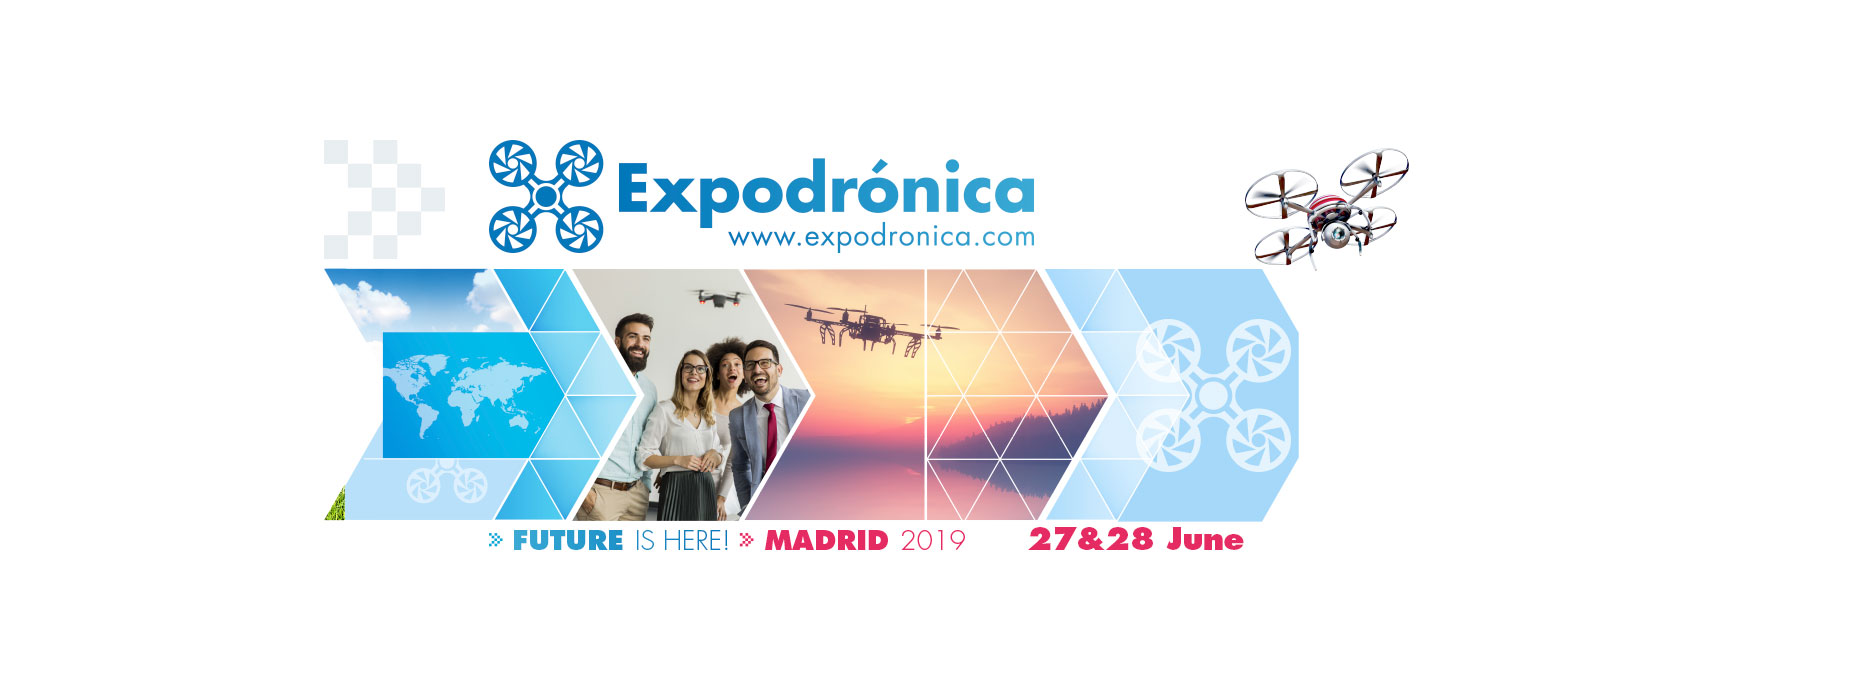 https://expodronica.com/wp-content/uploads/2019/02/banner-web-expodronica-2019.jpg